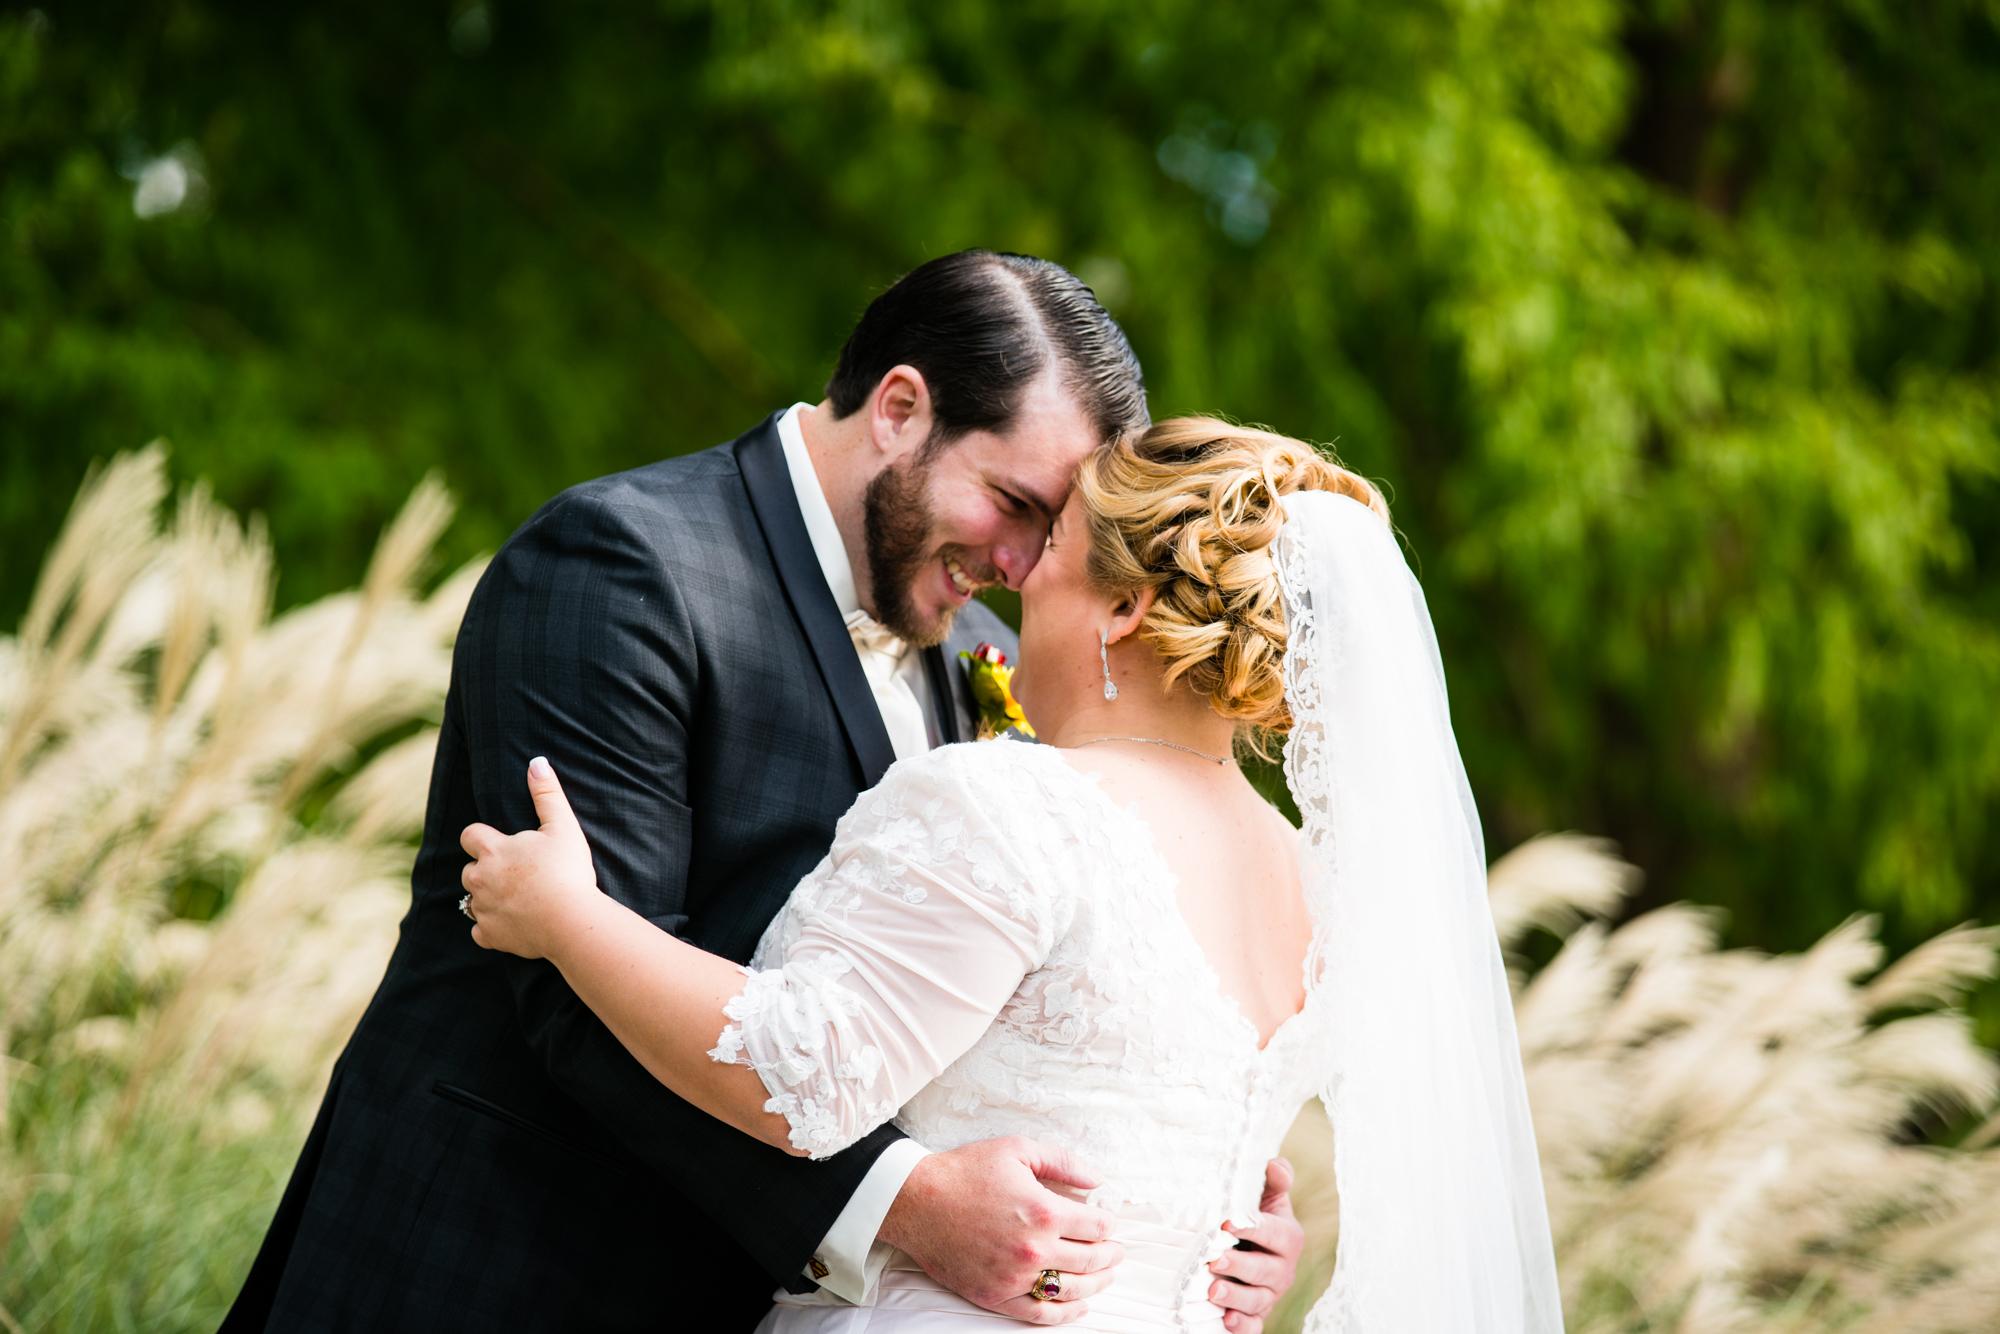 Cedar Brook Country Club Wedding Photography - Lovestruck Pictures-027.jpg